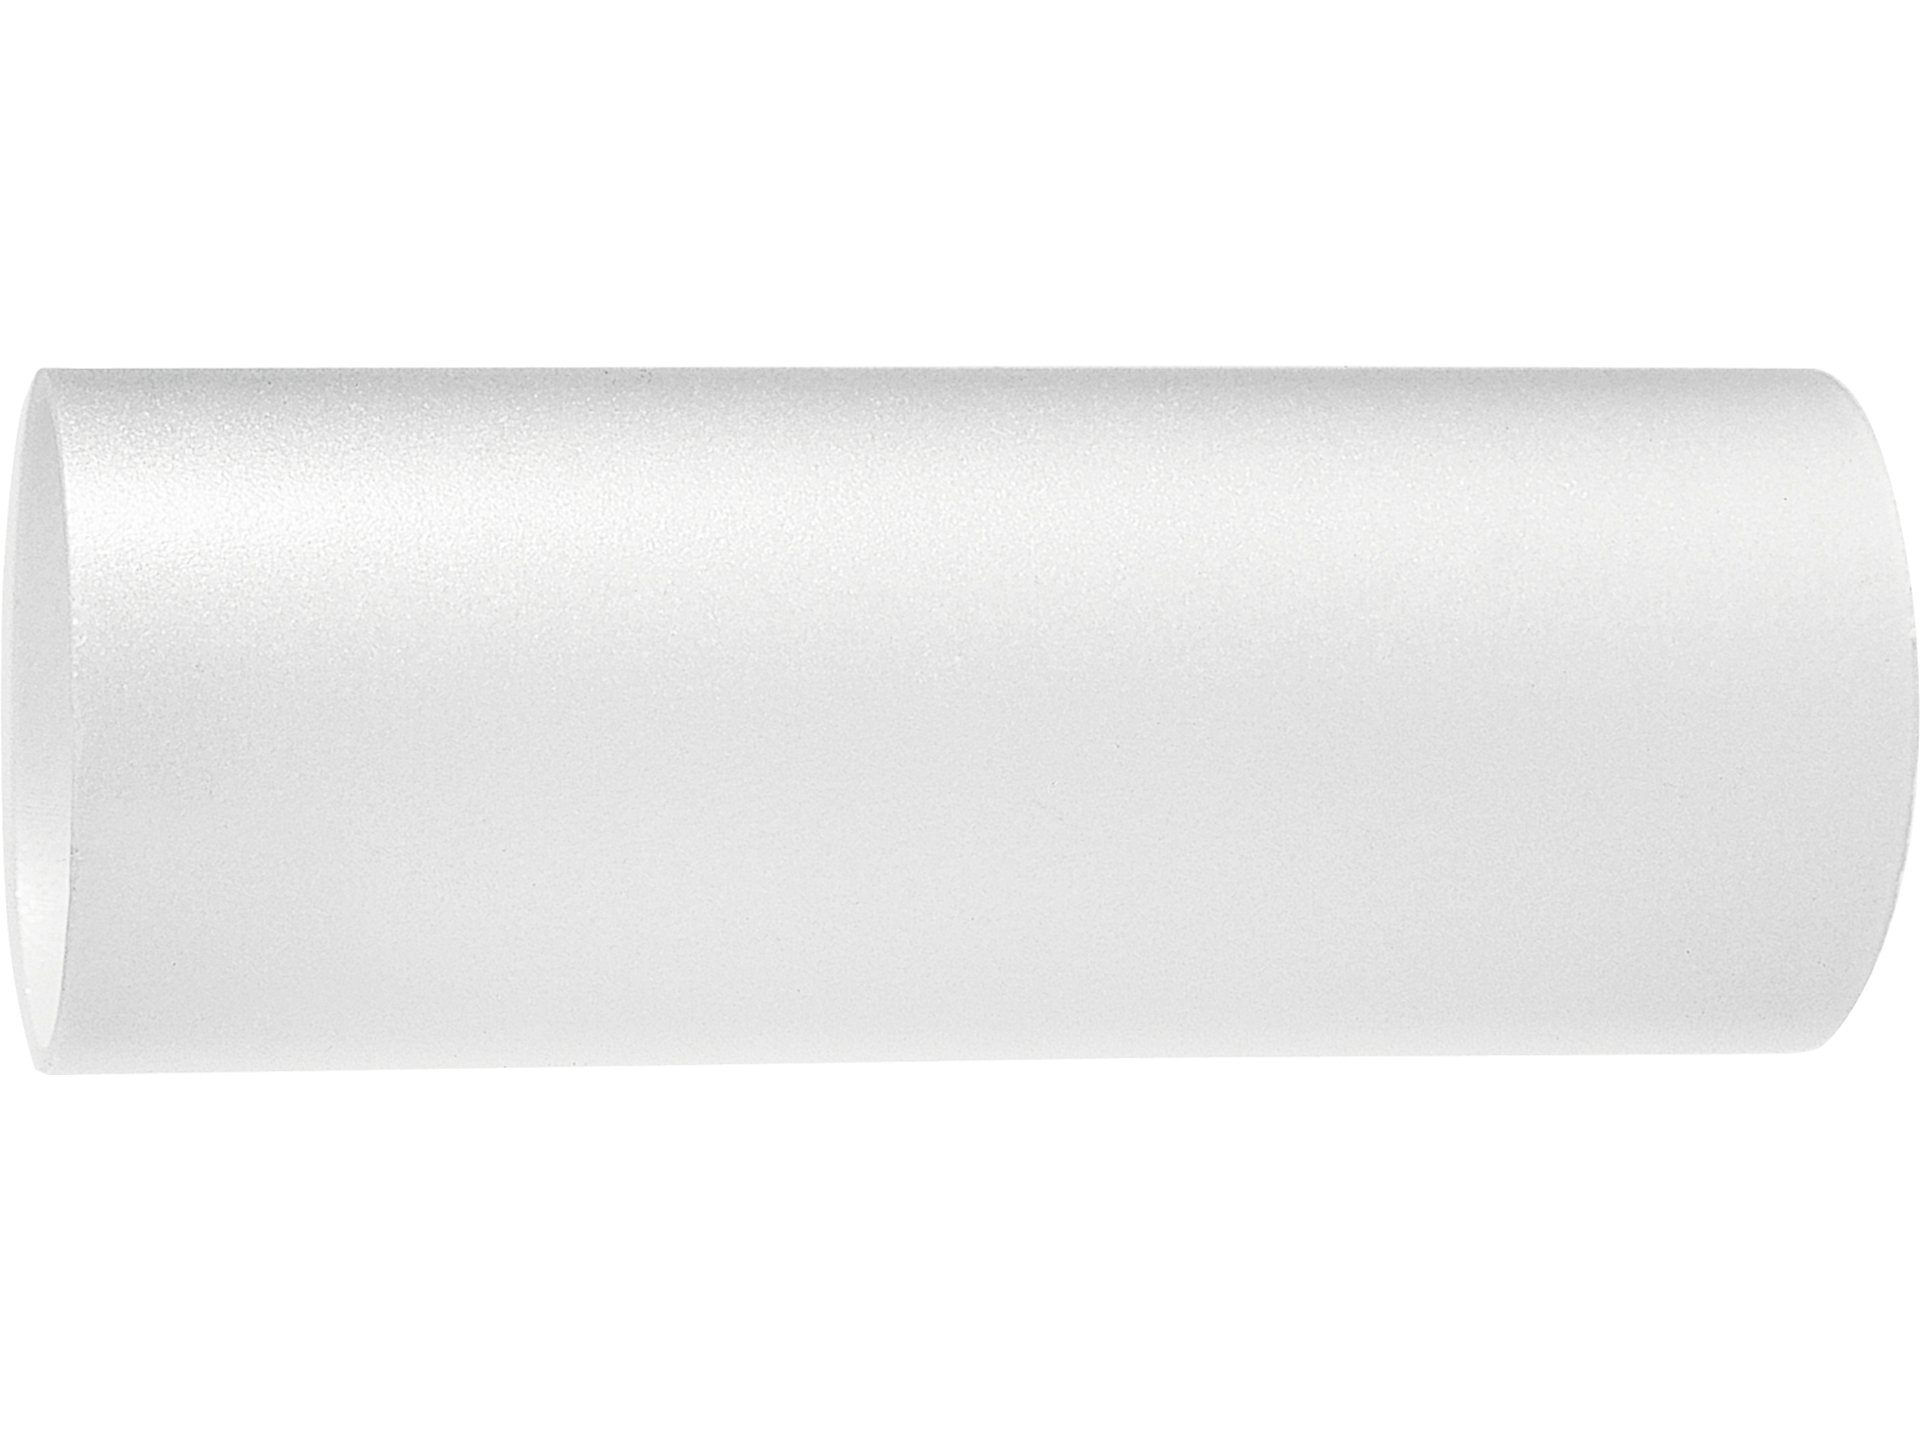 Cool Acrylglas XT Rundrohr, farblos online kaufen | Modulor UL42